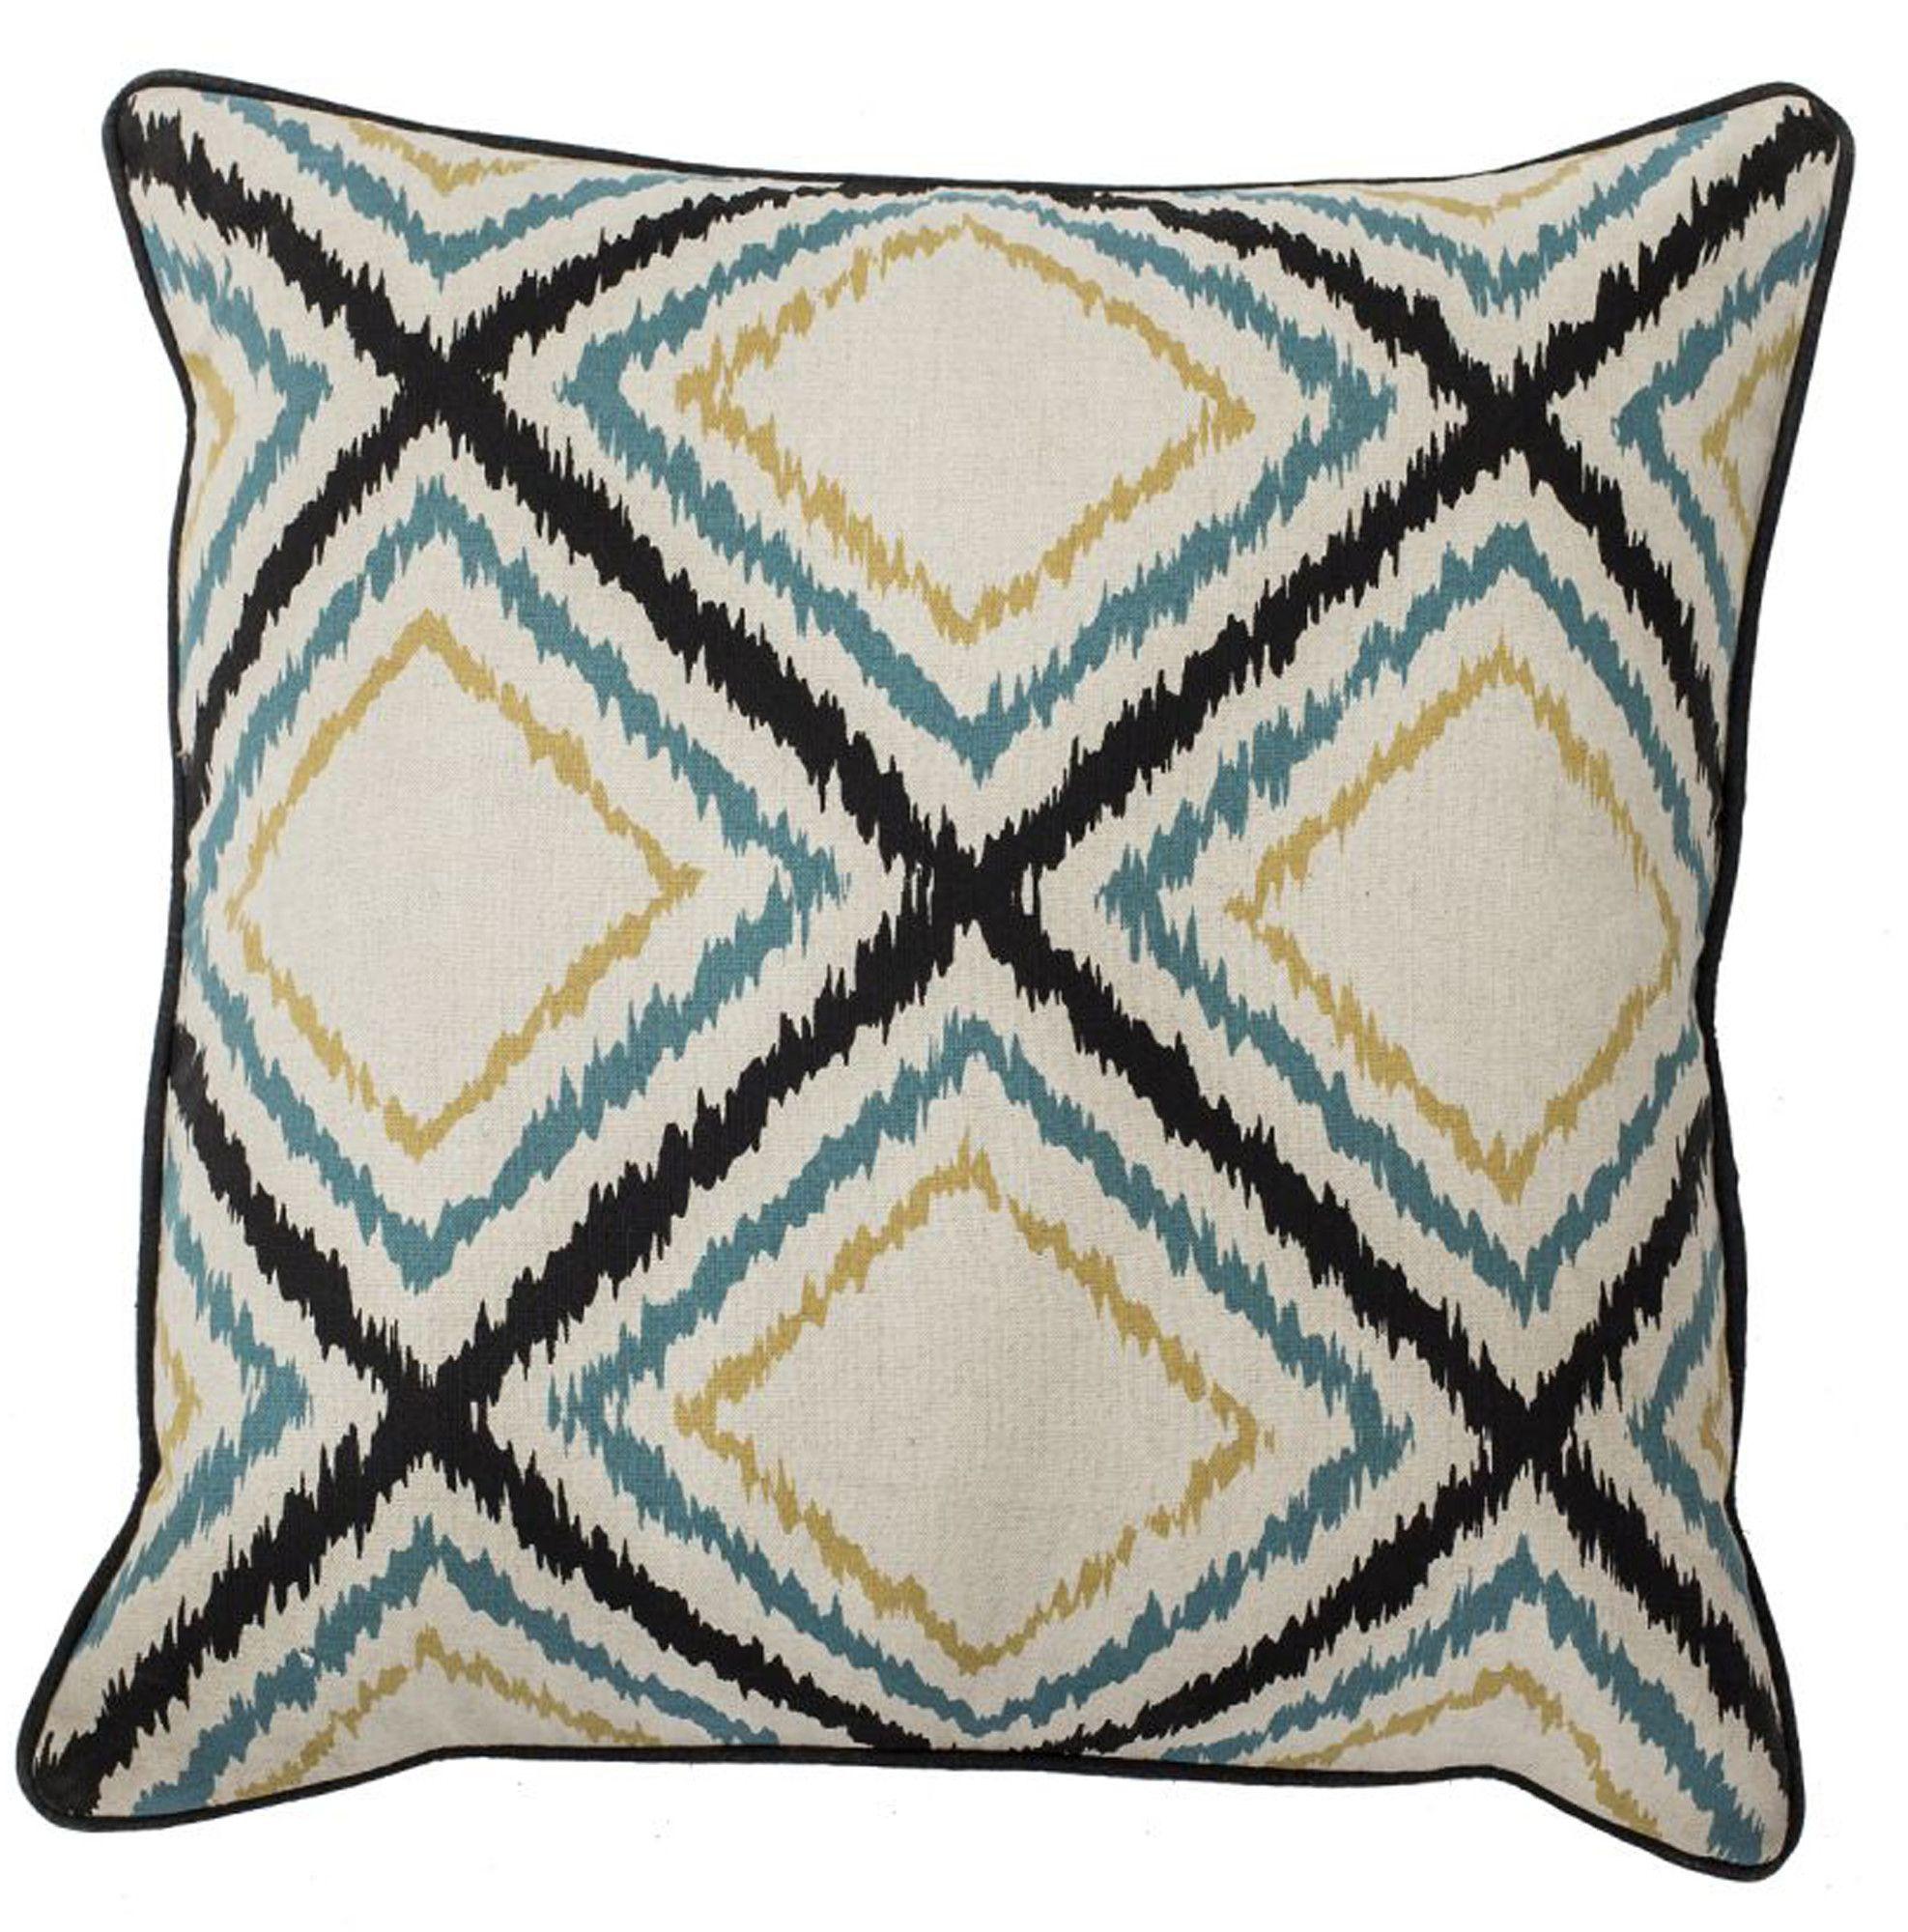 Blue The Pillow Collection Eleri Geometric Pillow